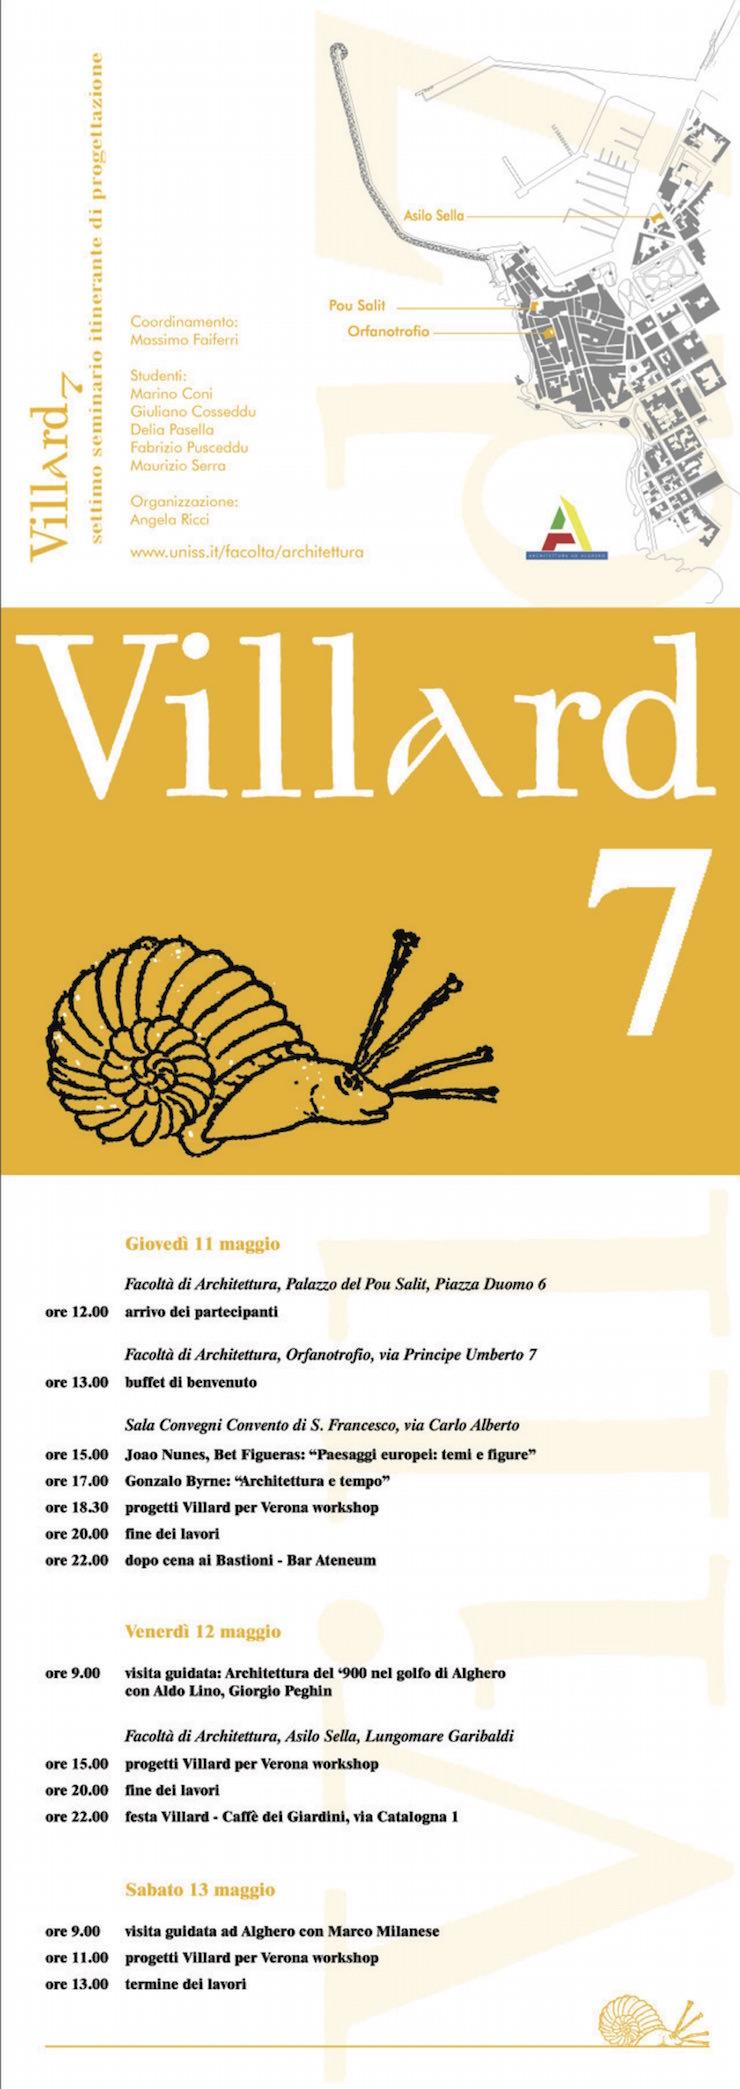 villard-7-alghero-programma